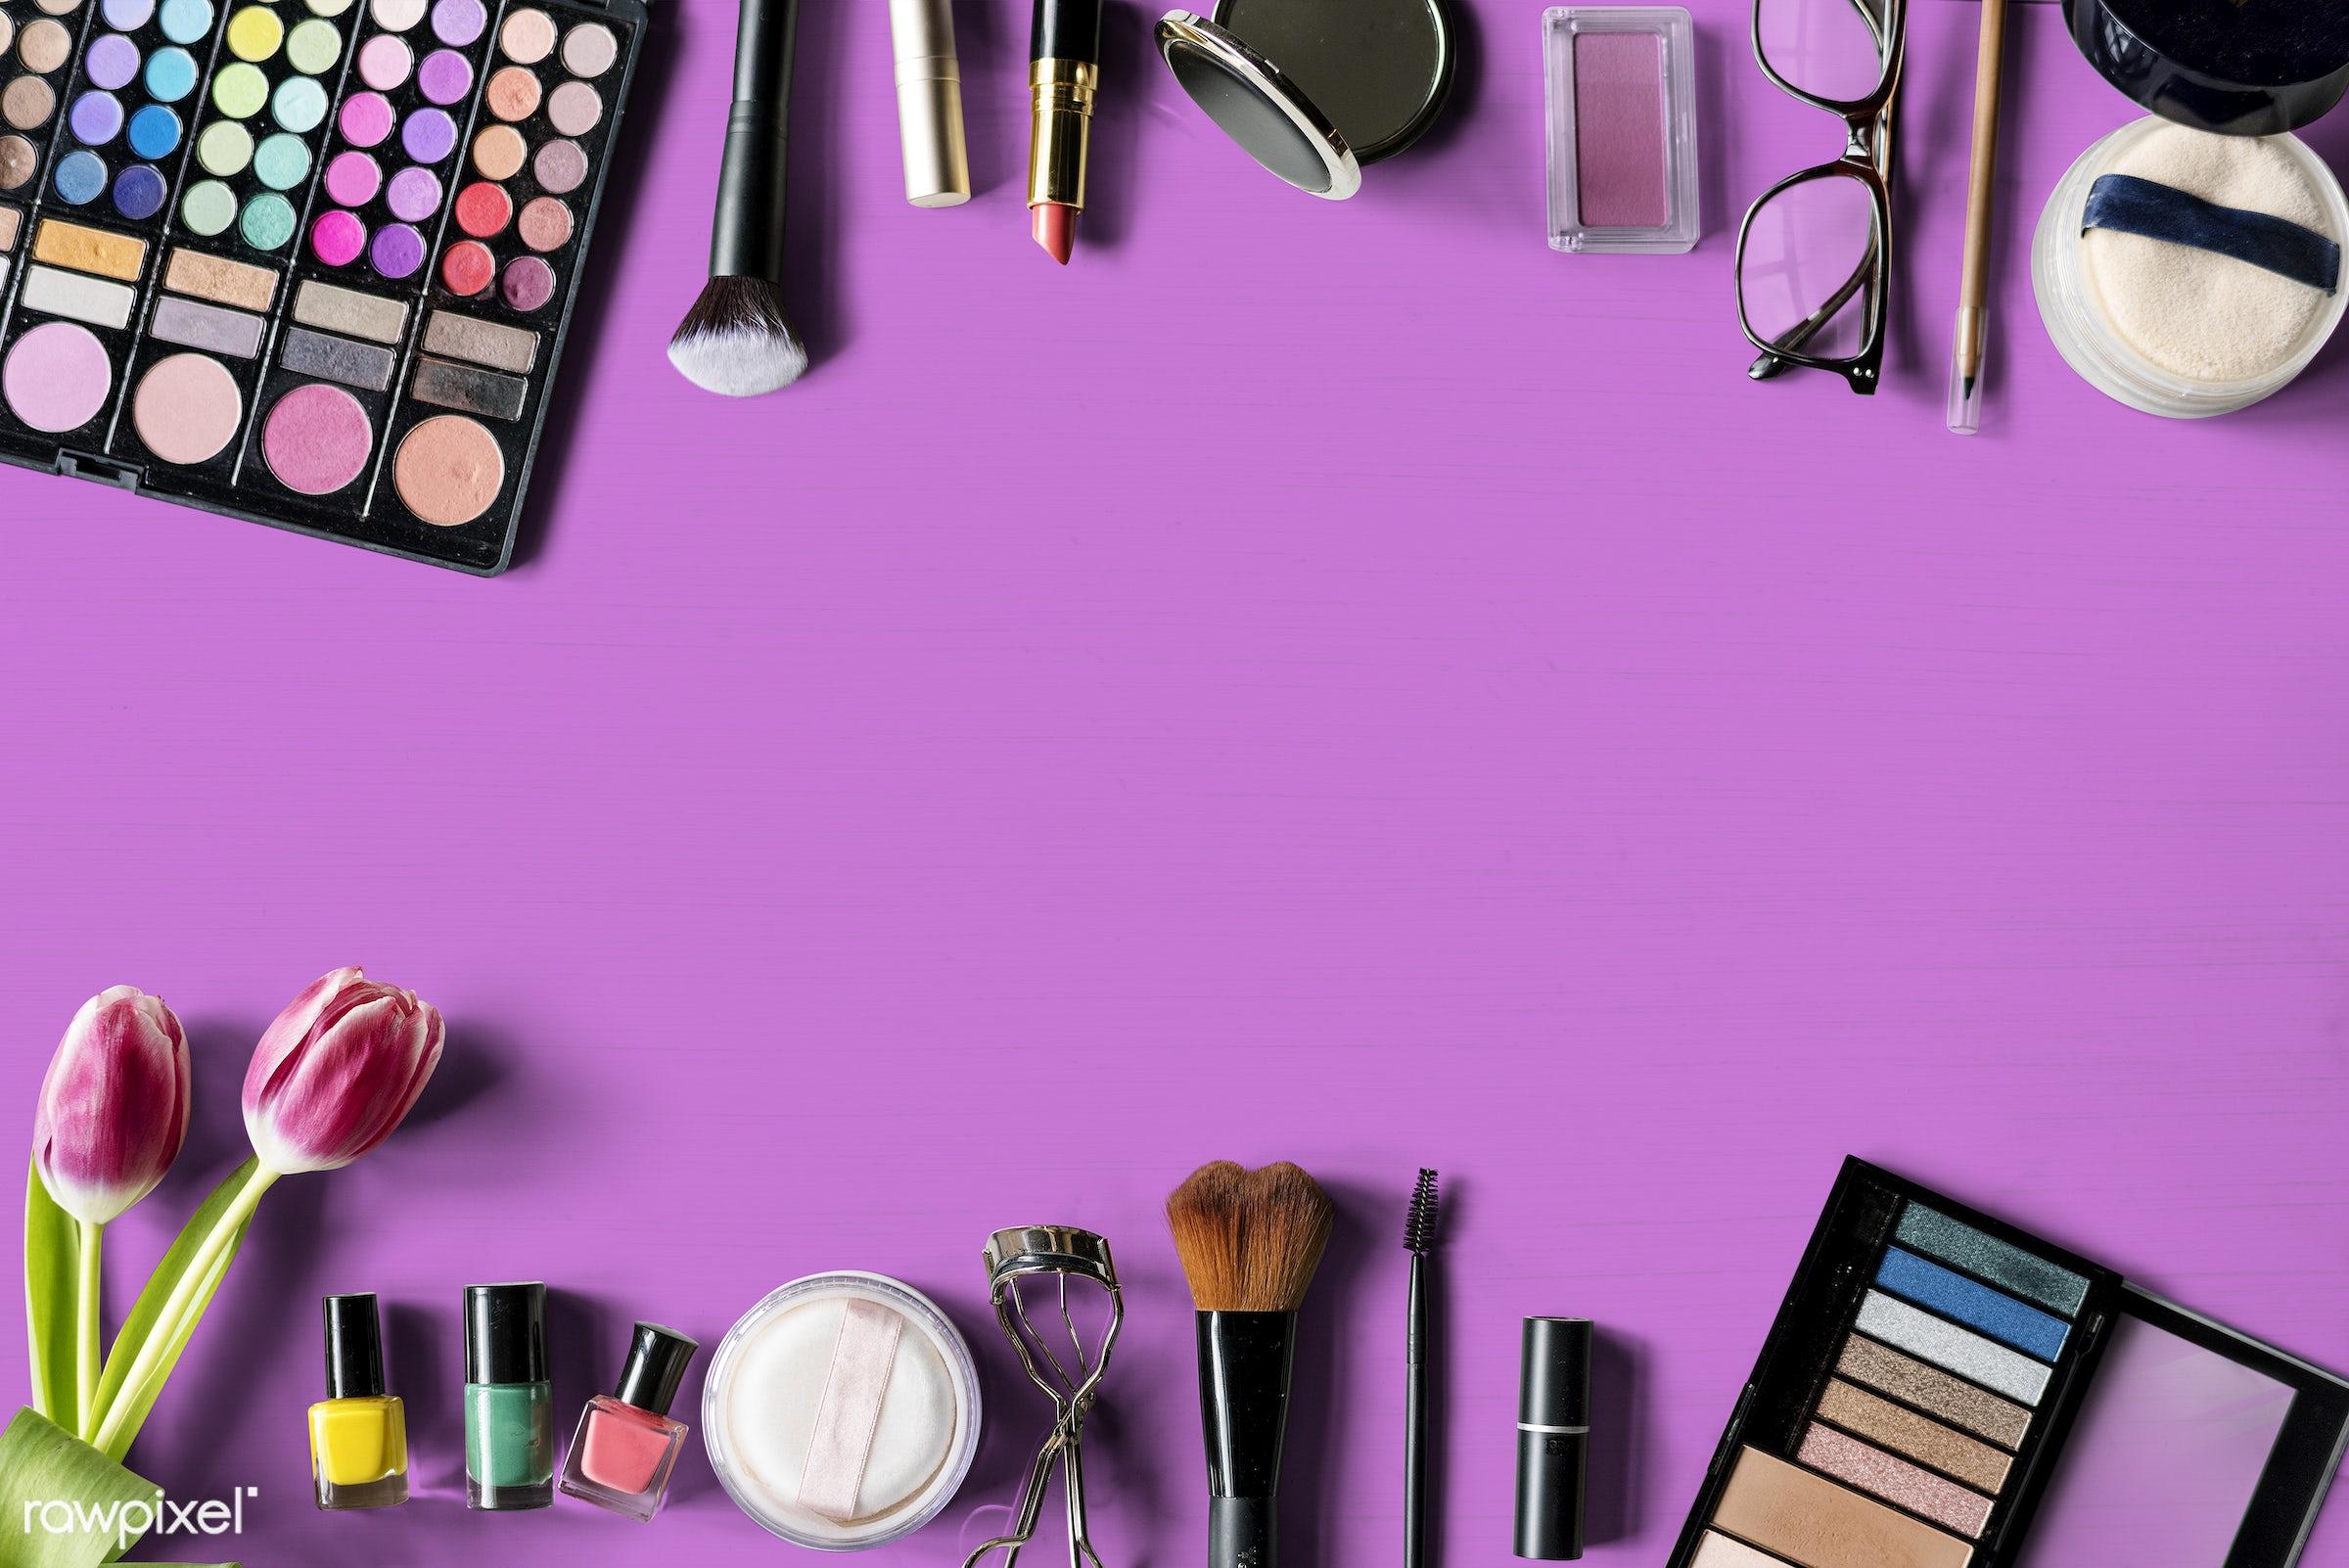 face, pastel, nail polish, glasses, makeup artist, colorful, makeup, set, treatment, palette, powder, blusher, collection,...